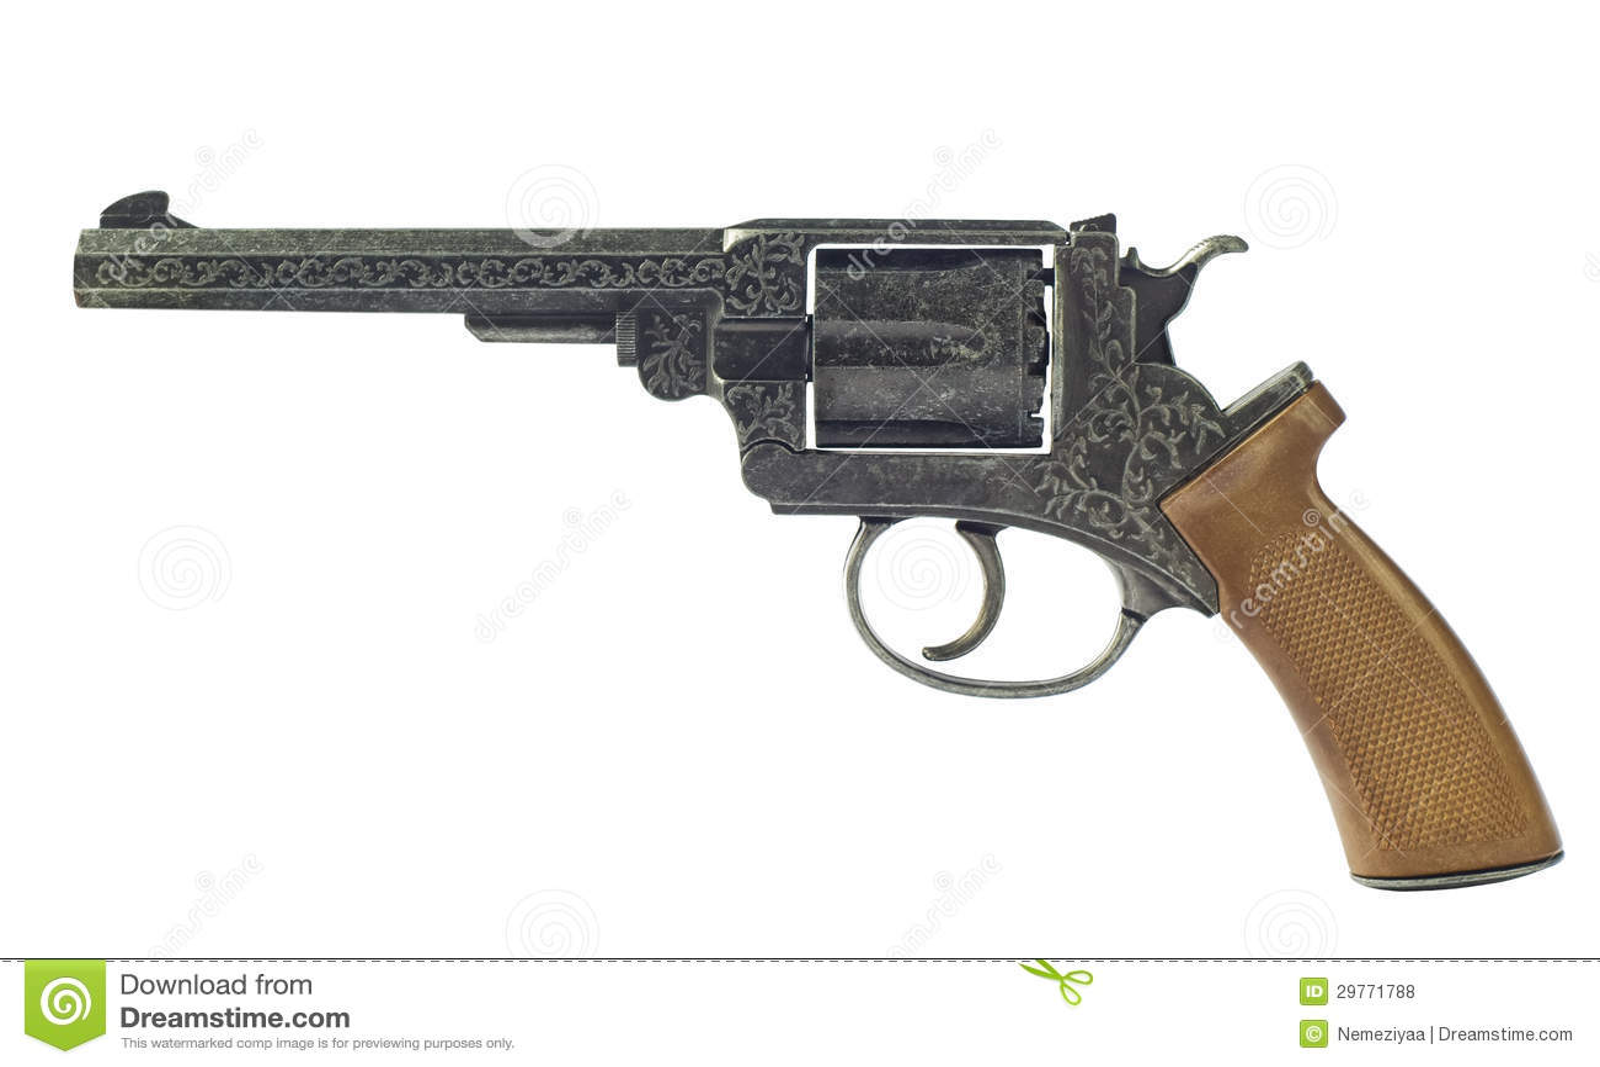 gun white background - photo #47